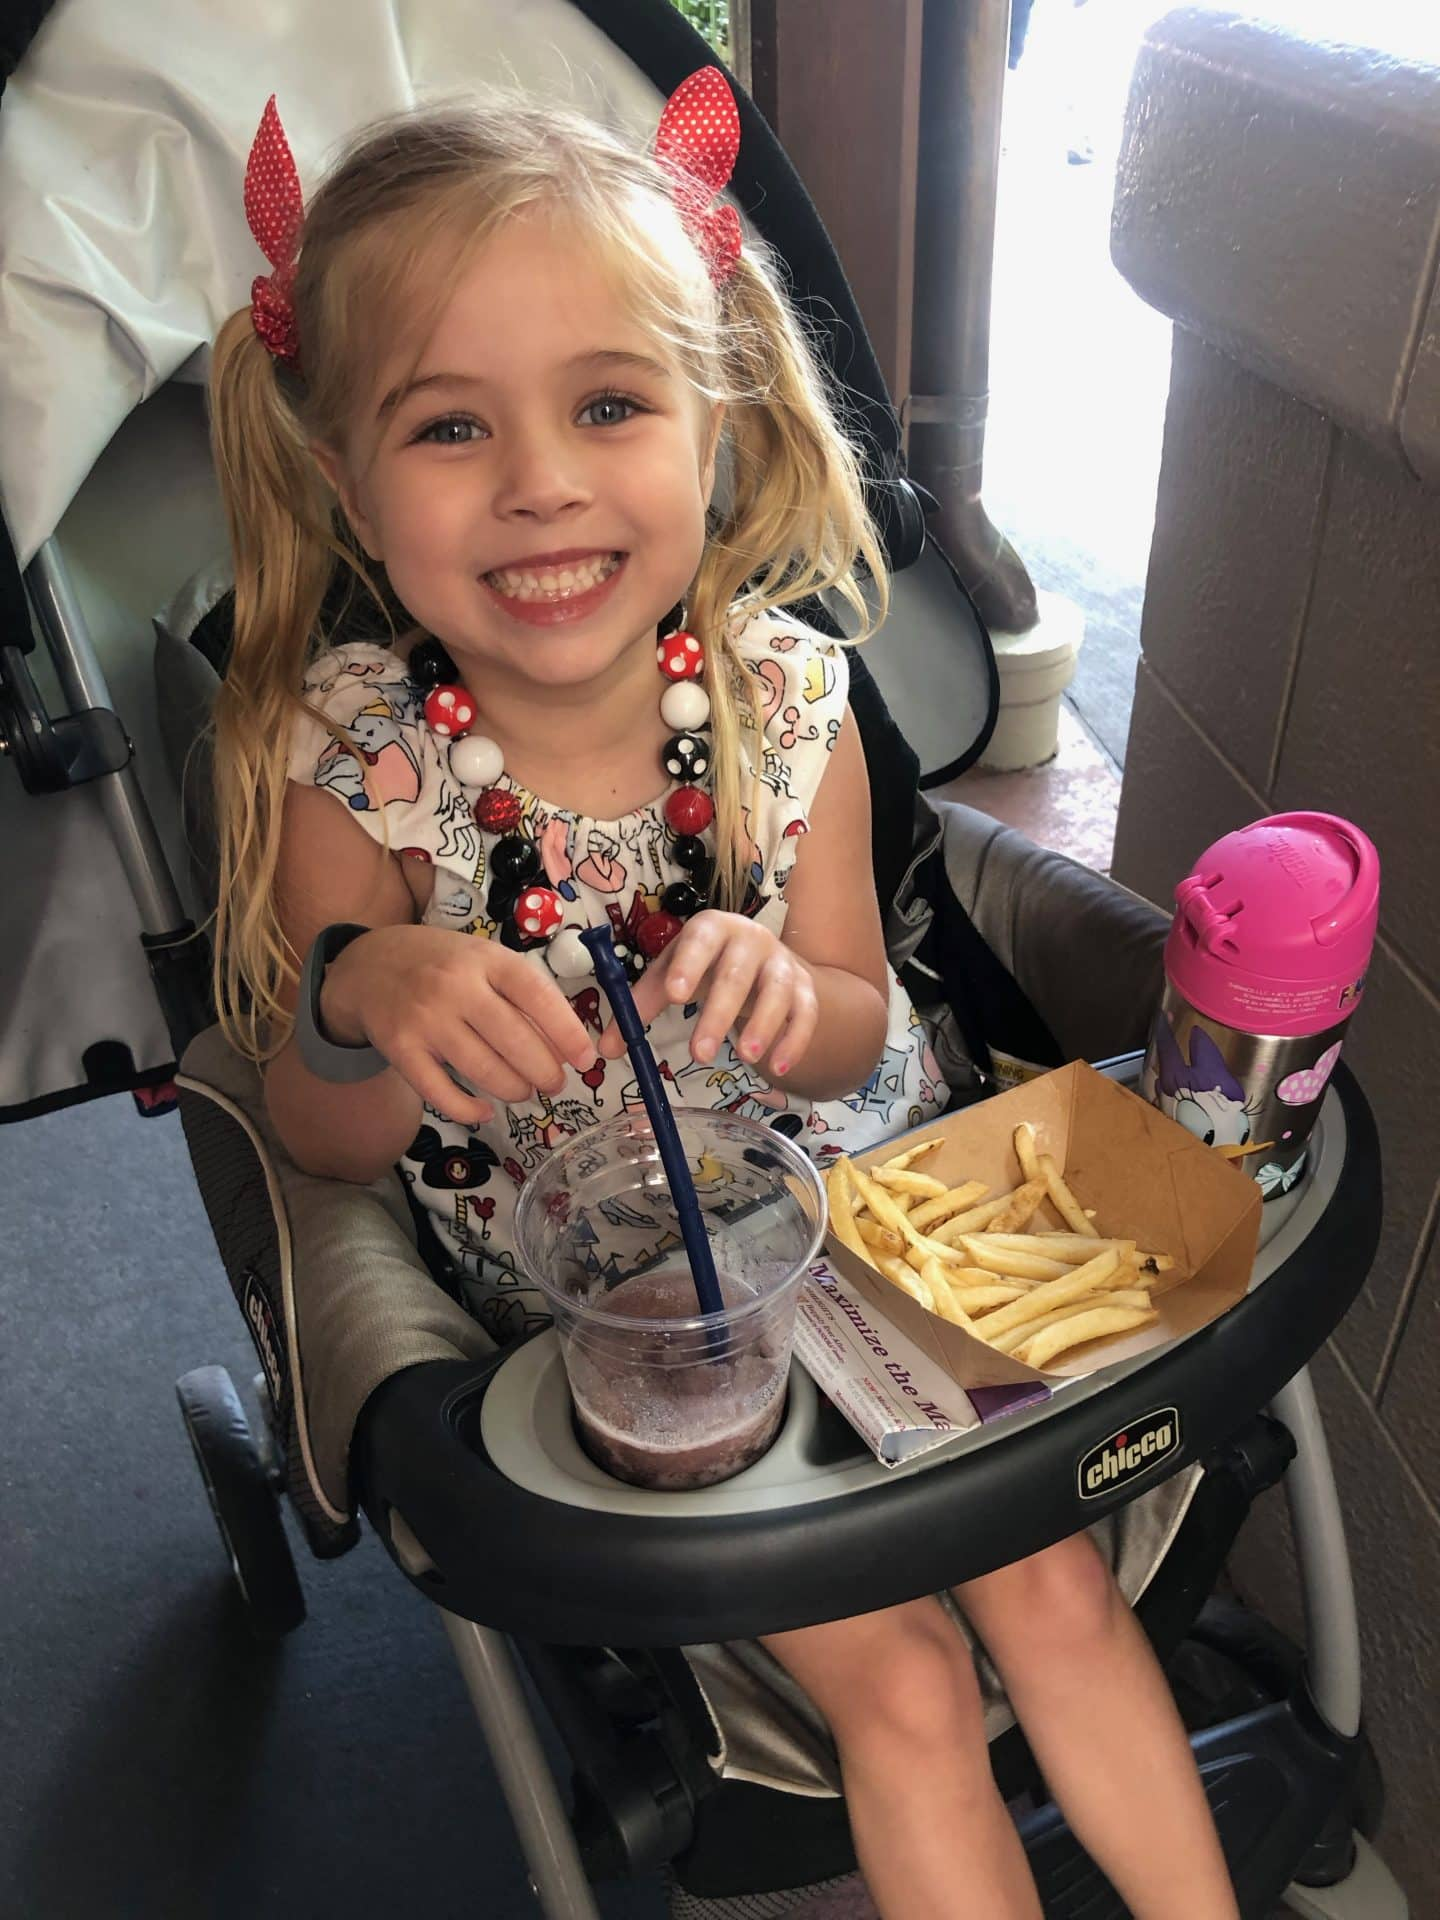 girl eating food in stroller at disney